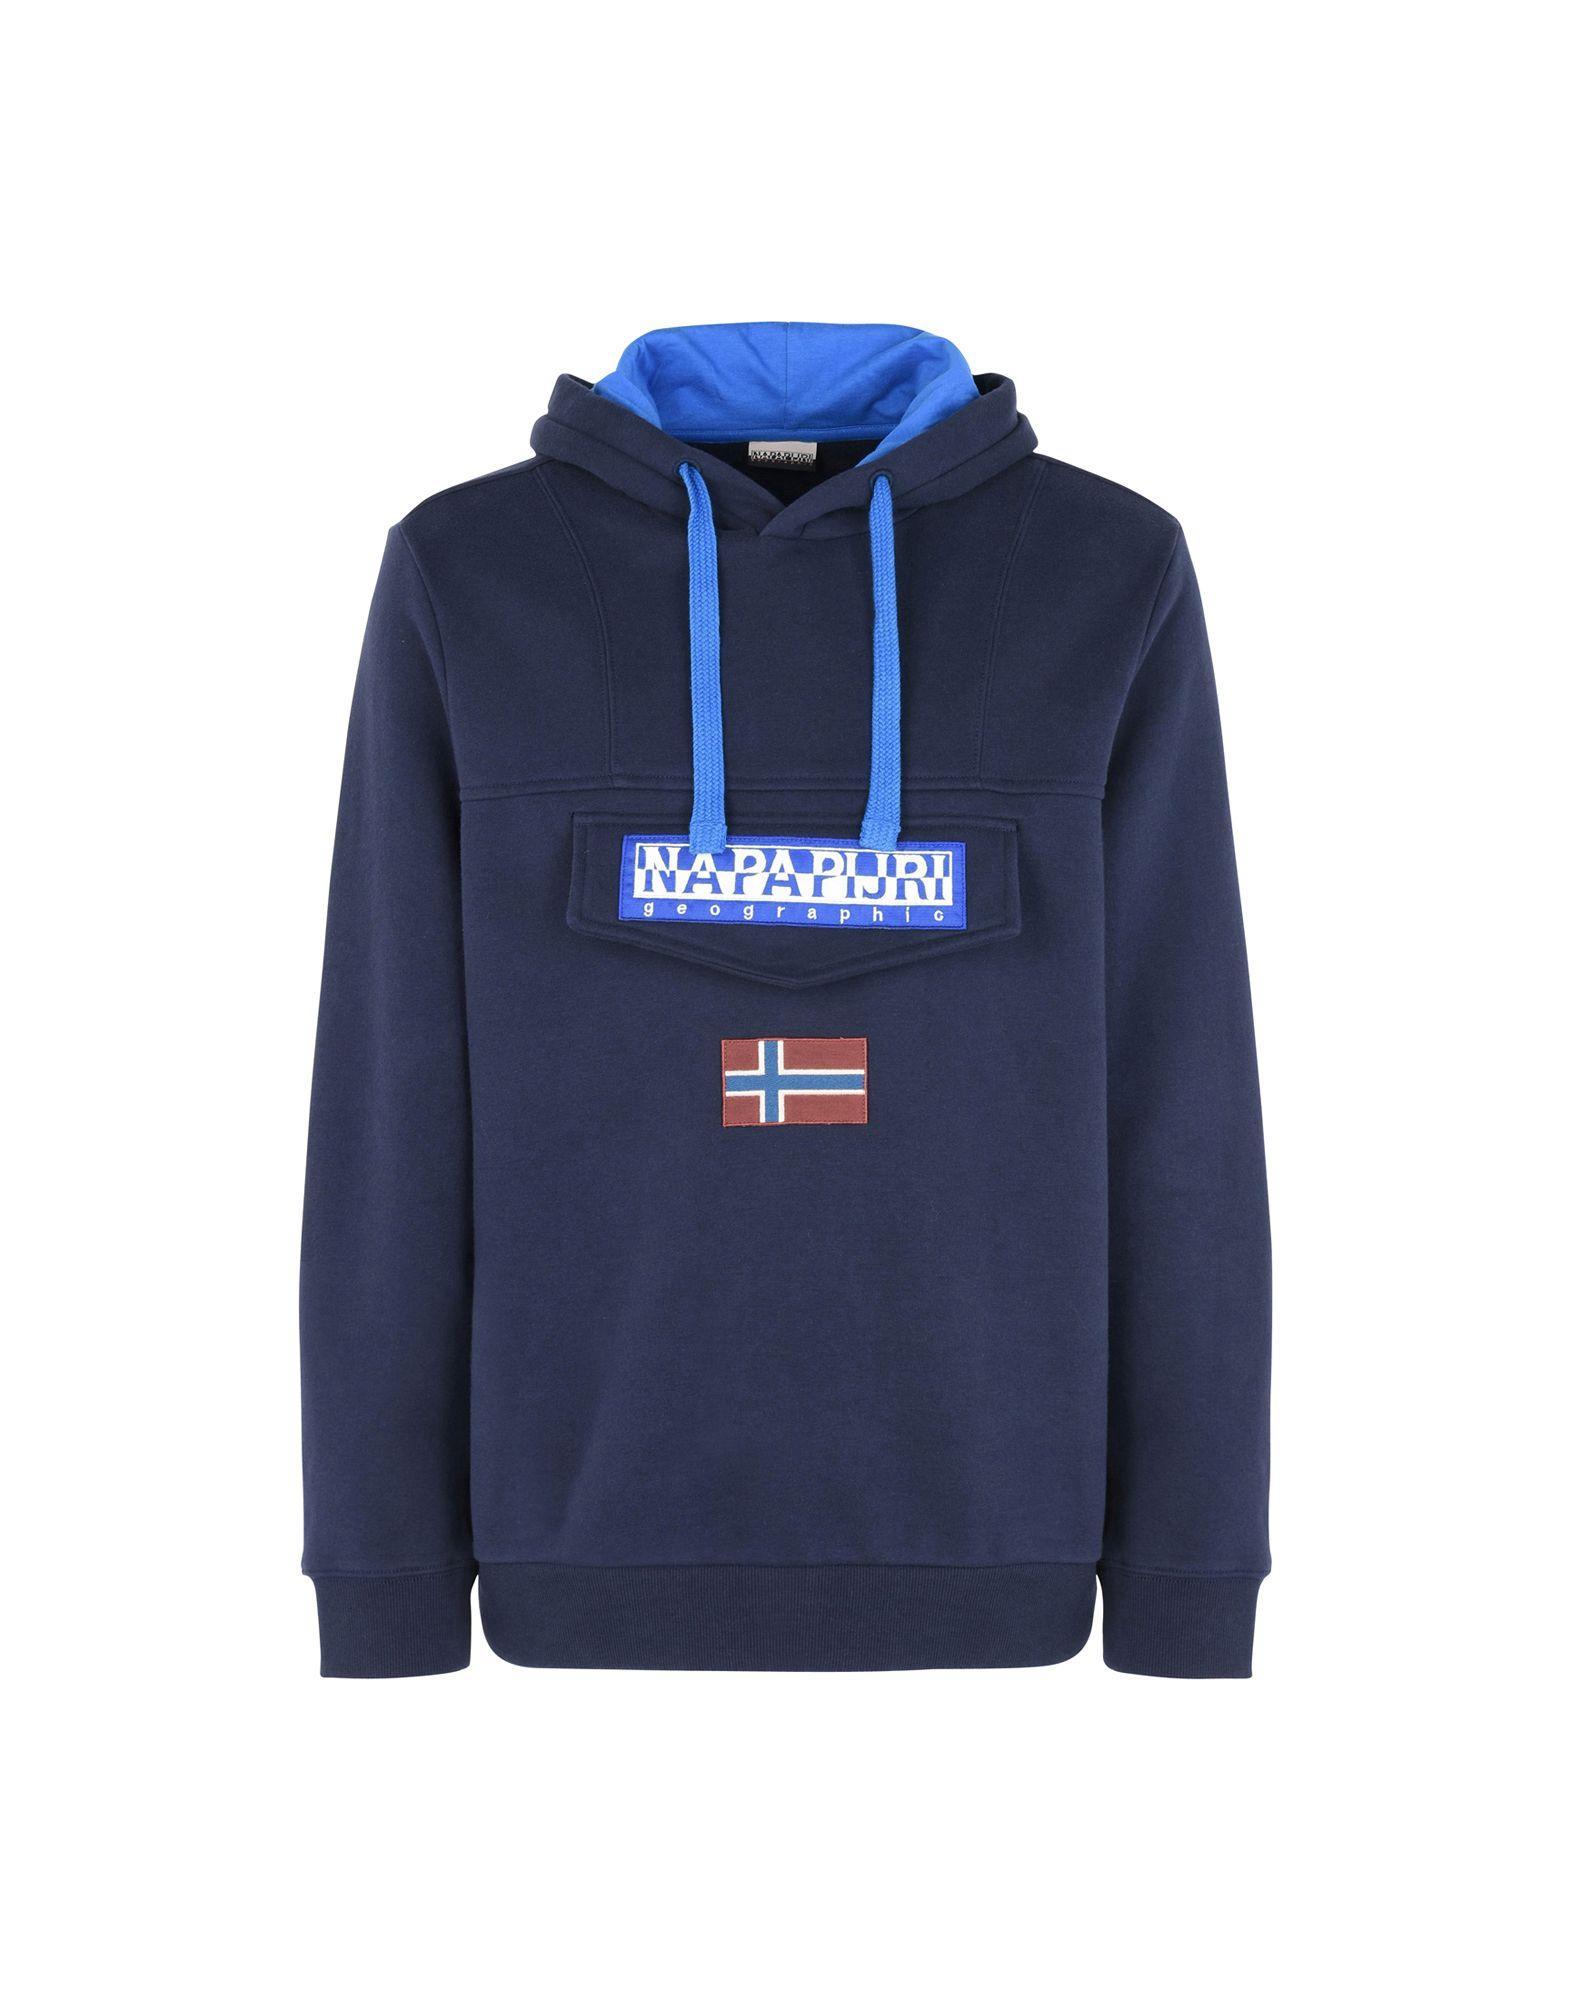 Napapijri Blue Regular Fit Hooded sweatshirt